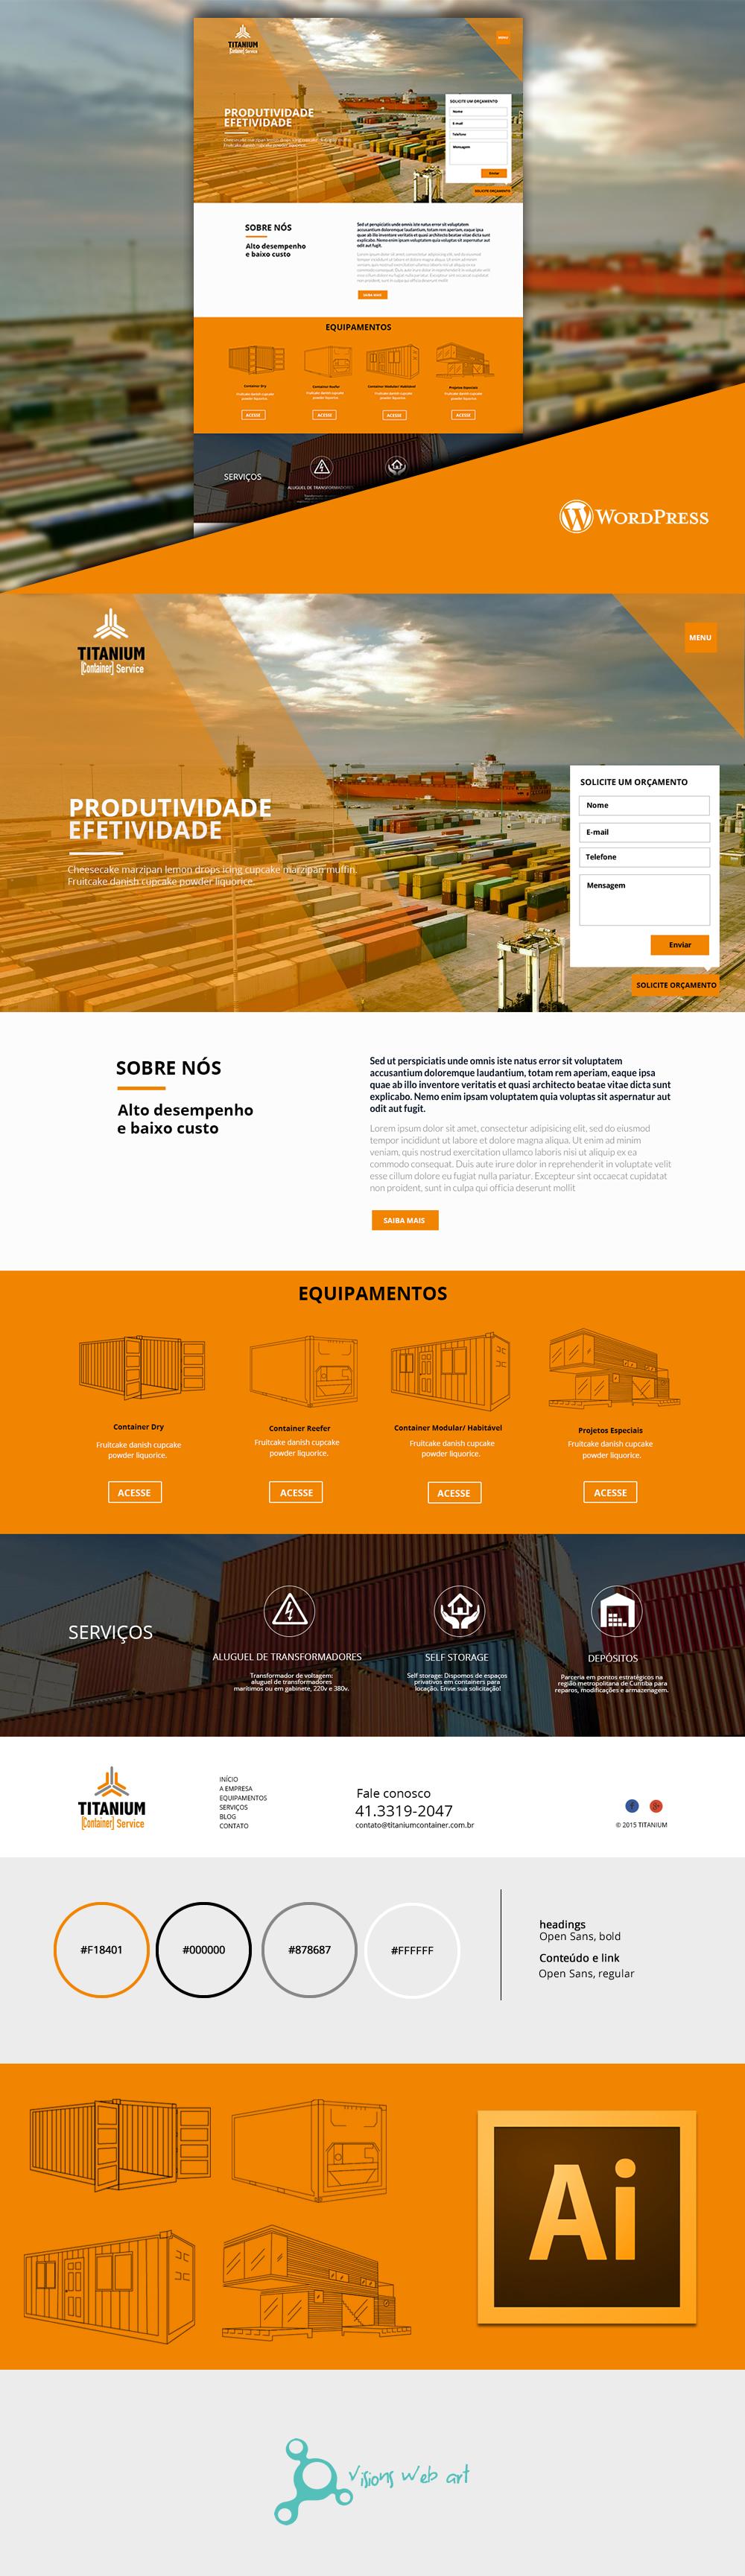 wordpress Responsive Web flat design orange design